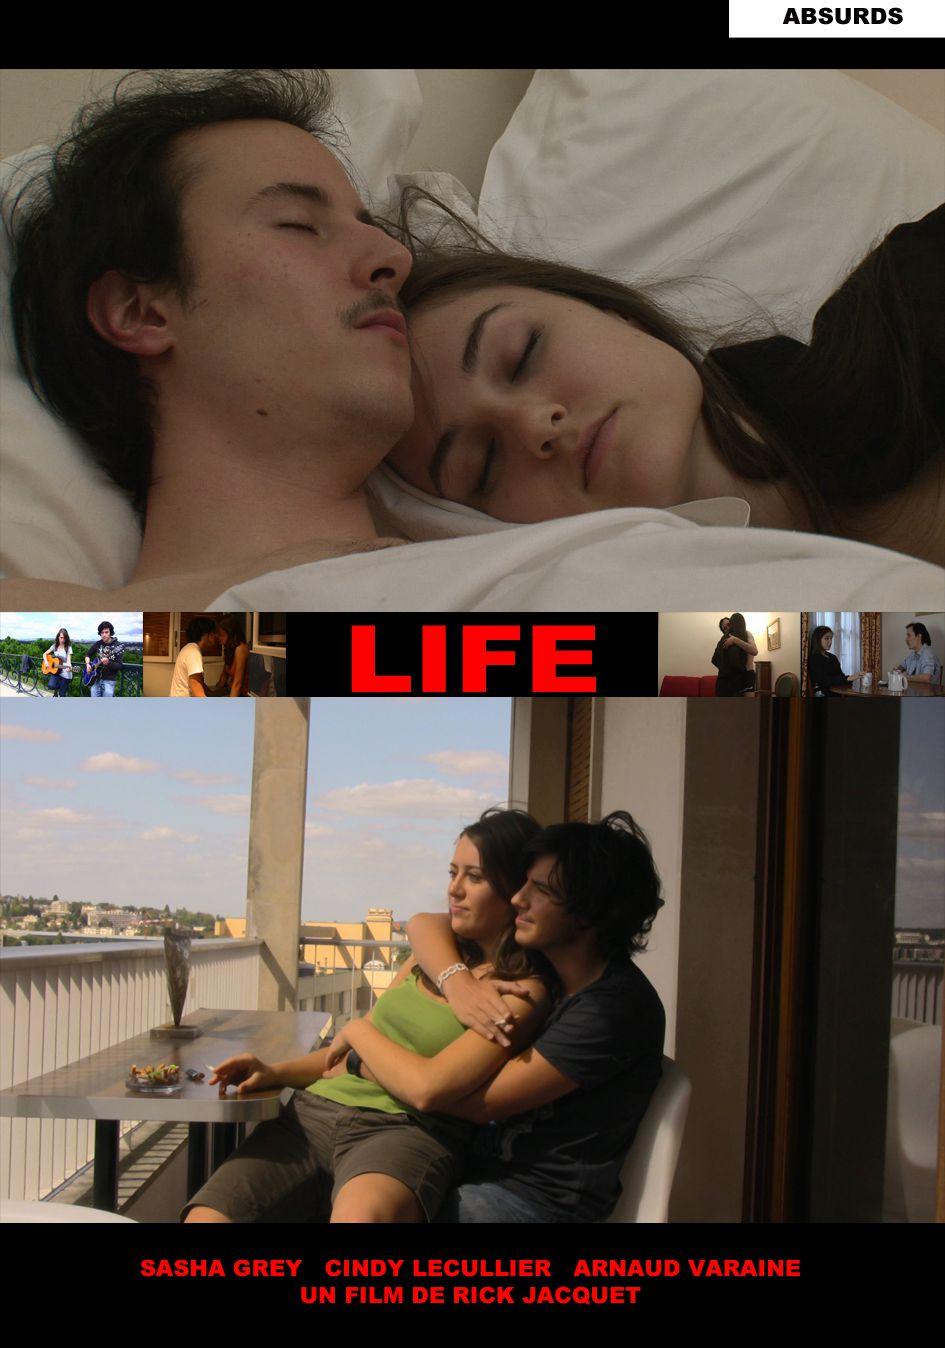 Life - Film (2011)